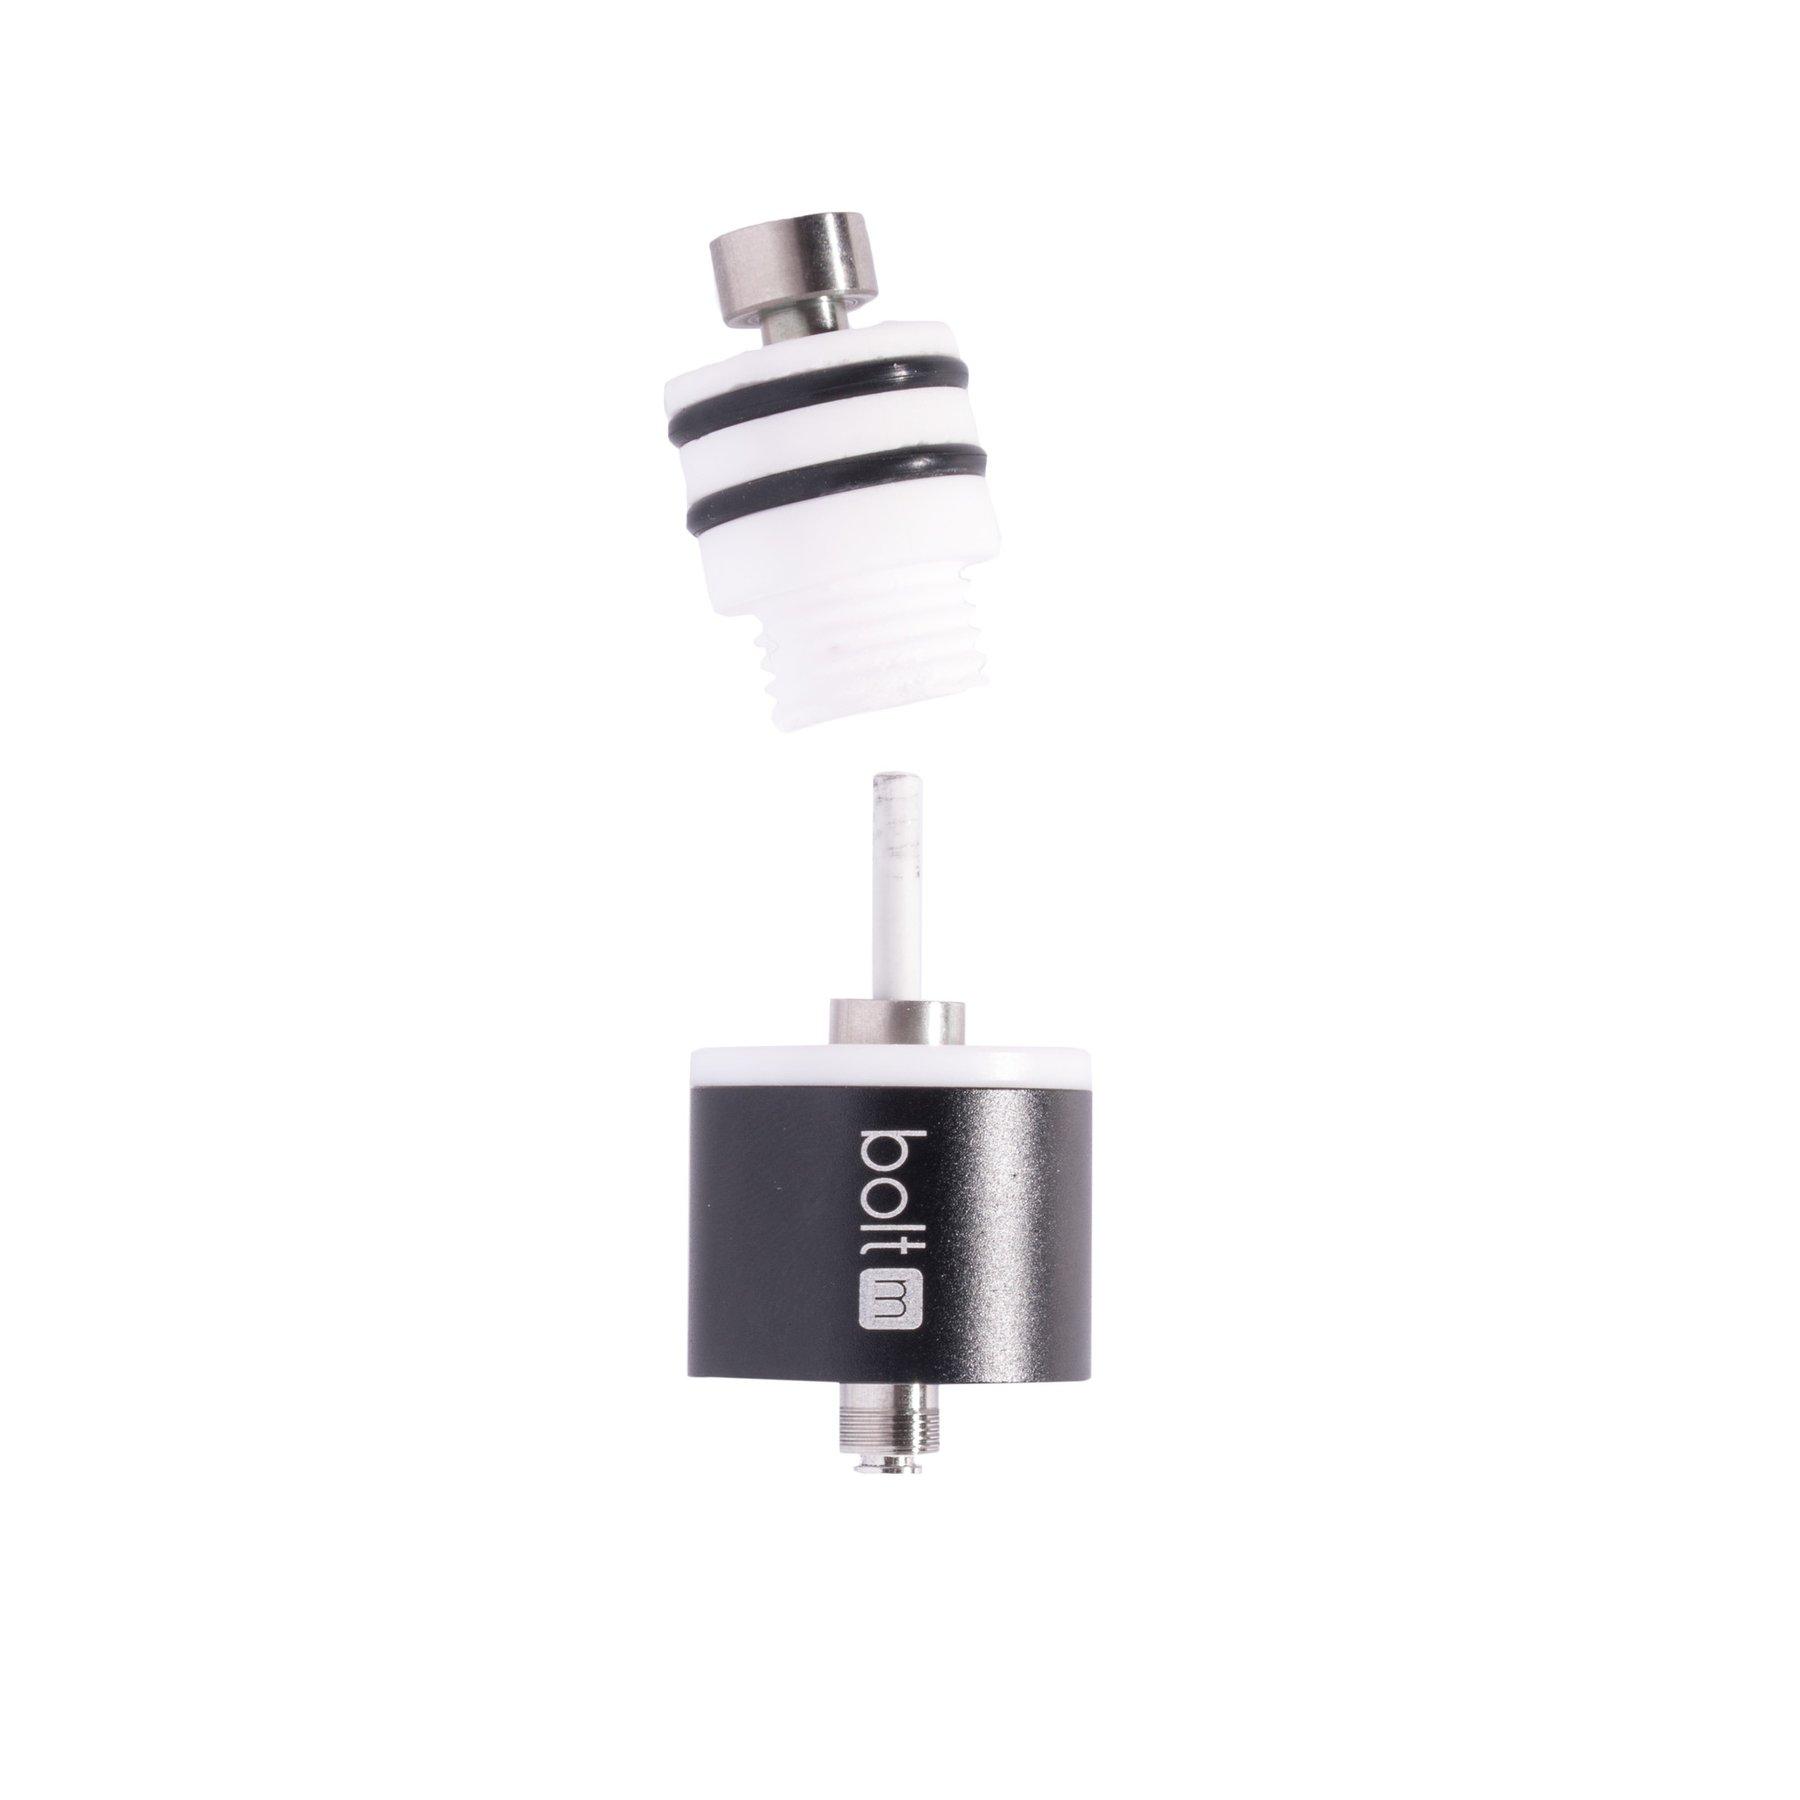 Bolt M - 510 Nail Mod Box Atomizer For Dabs – Dabado Vaporizers